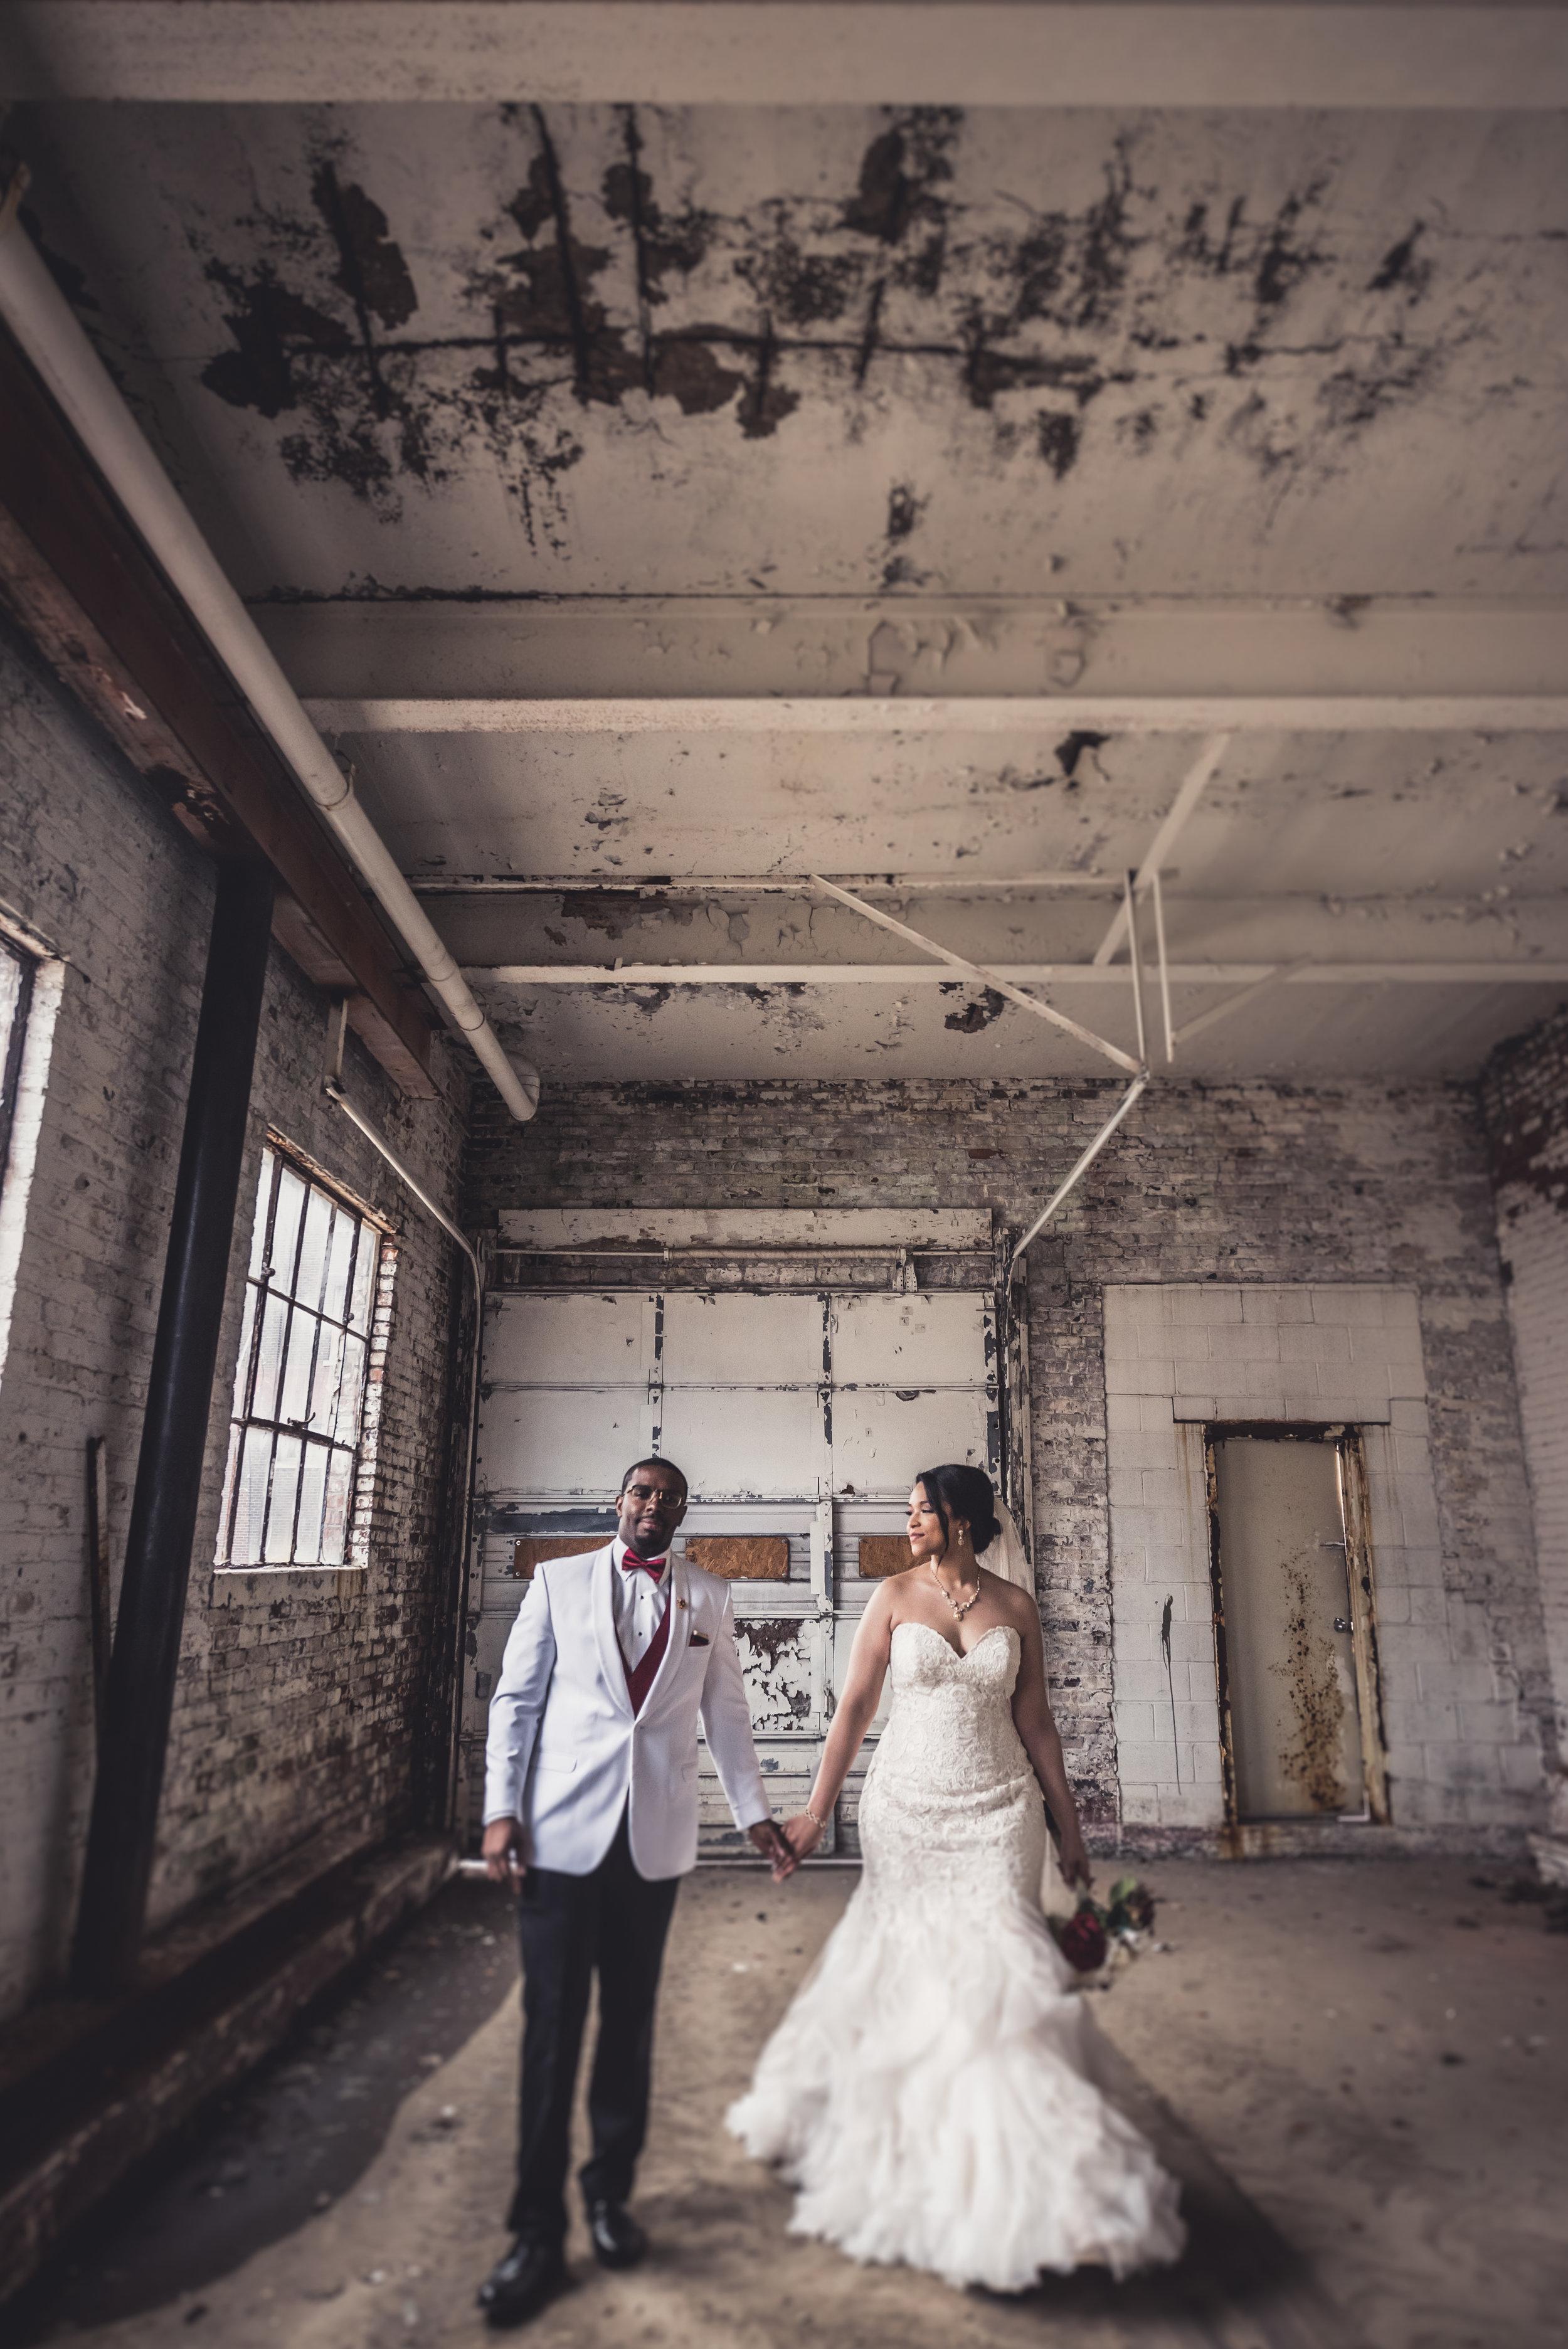 Burlington Iowa Wedding Midwest Photographer Melissa Cervantes _ Chantelle and Isaiah 320p.jpg